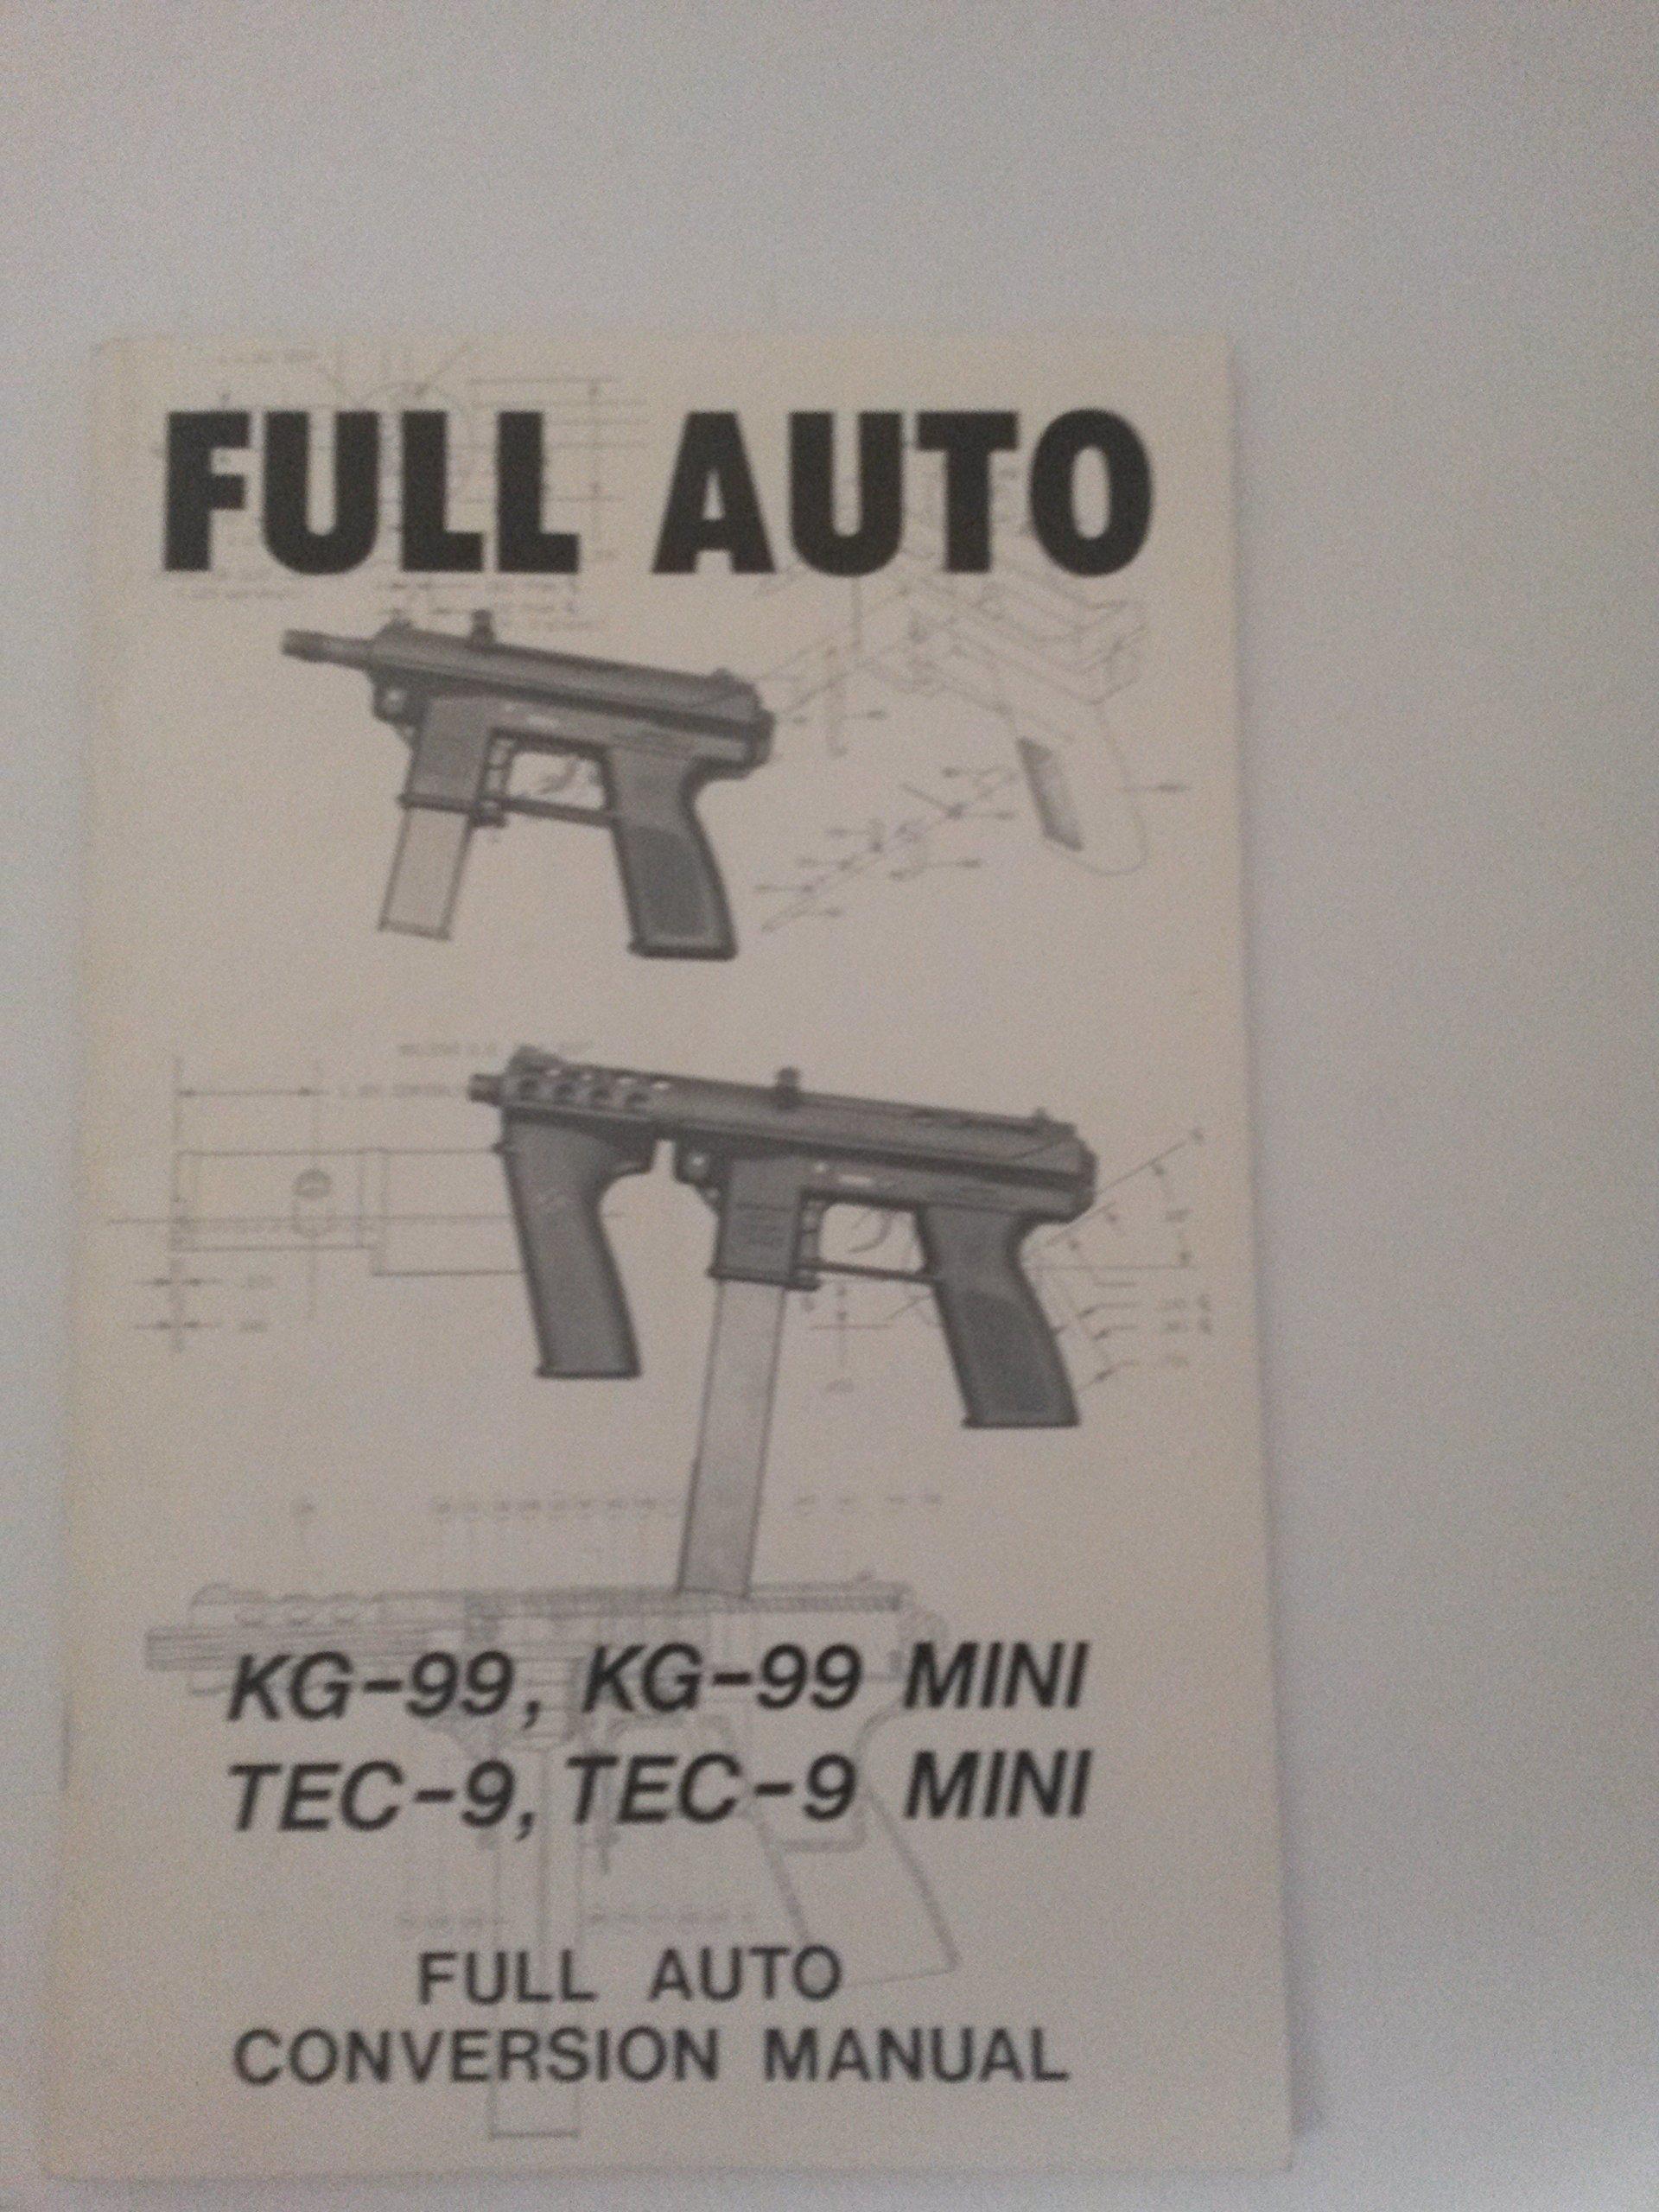 full auto kg 99 kg 99 mini tec 9 tec 9 mini full auto conversion rh amazon com tec 9 owner's manual Intratec 9Mm